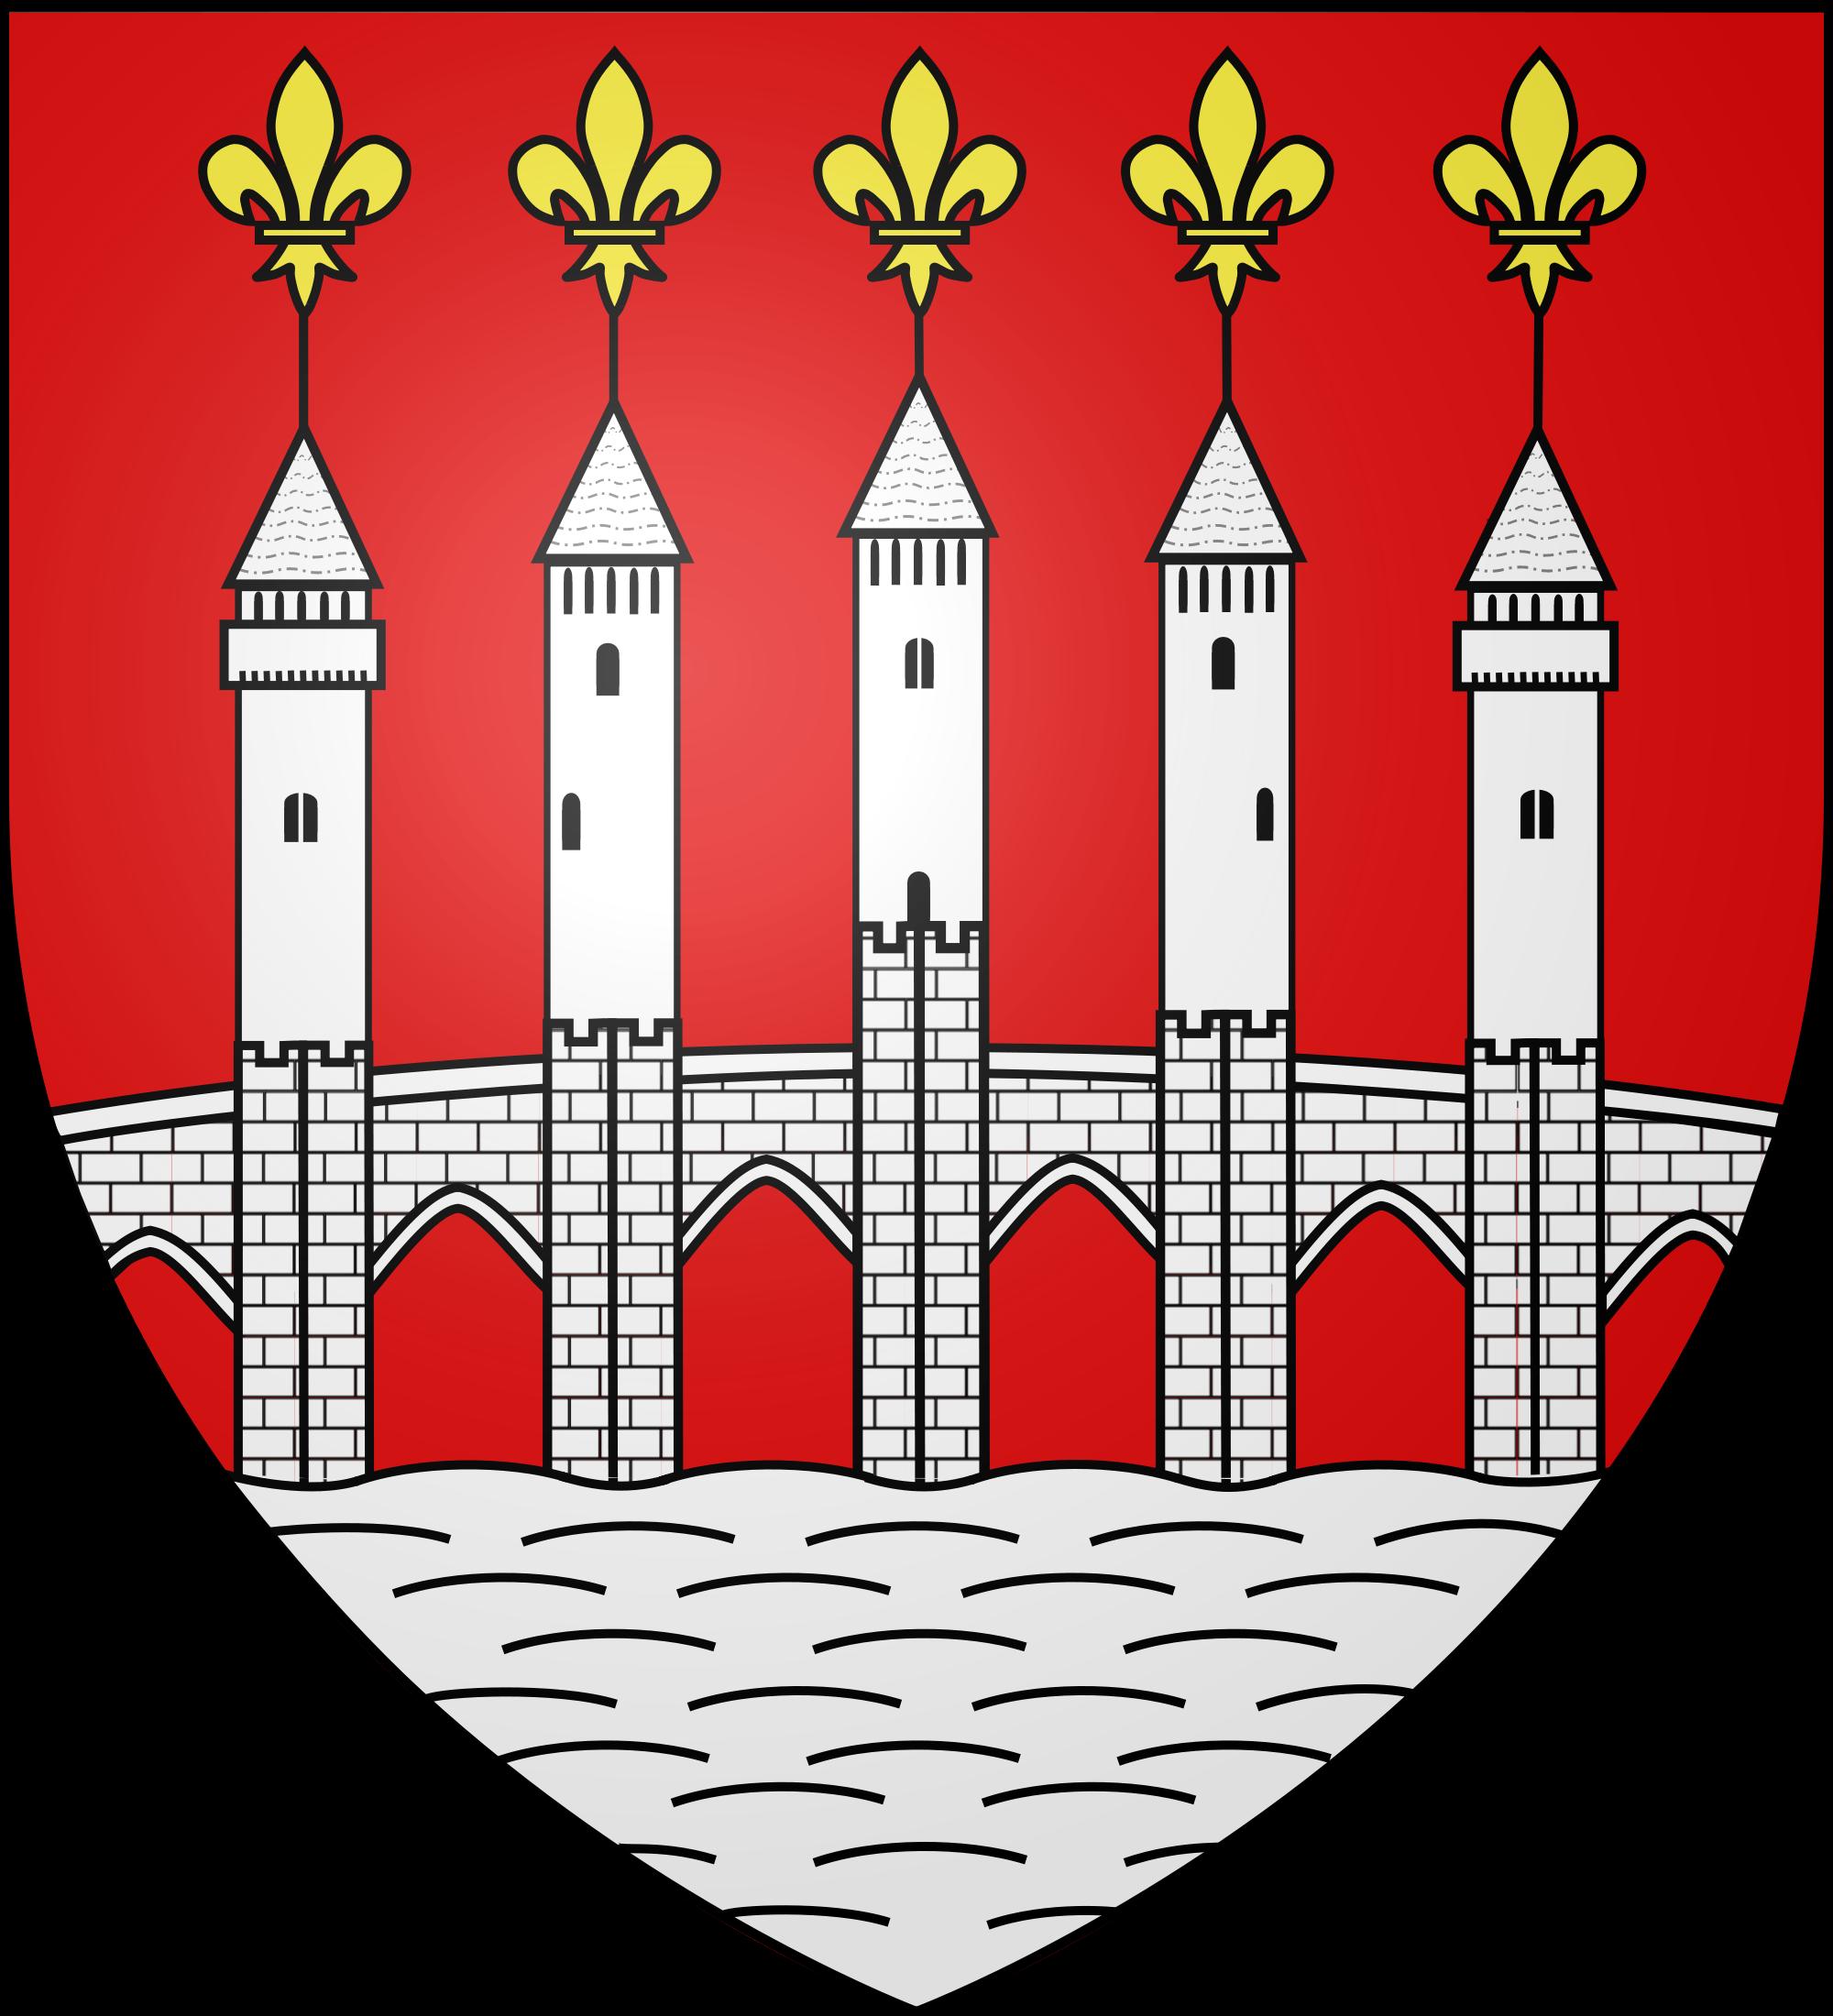 File:Blason Ville Cahors fr (Lot).svg.